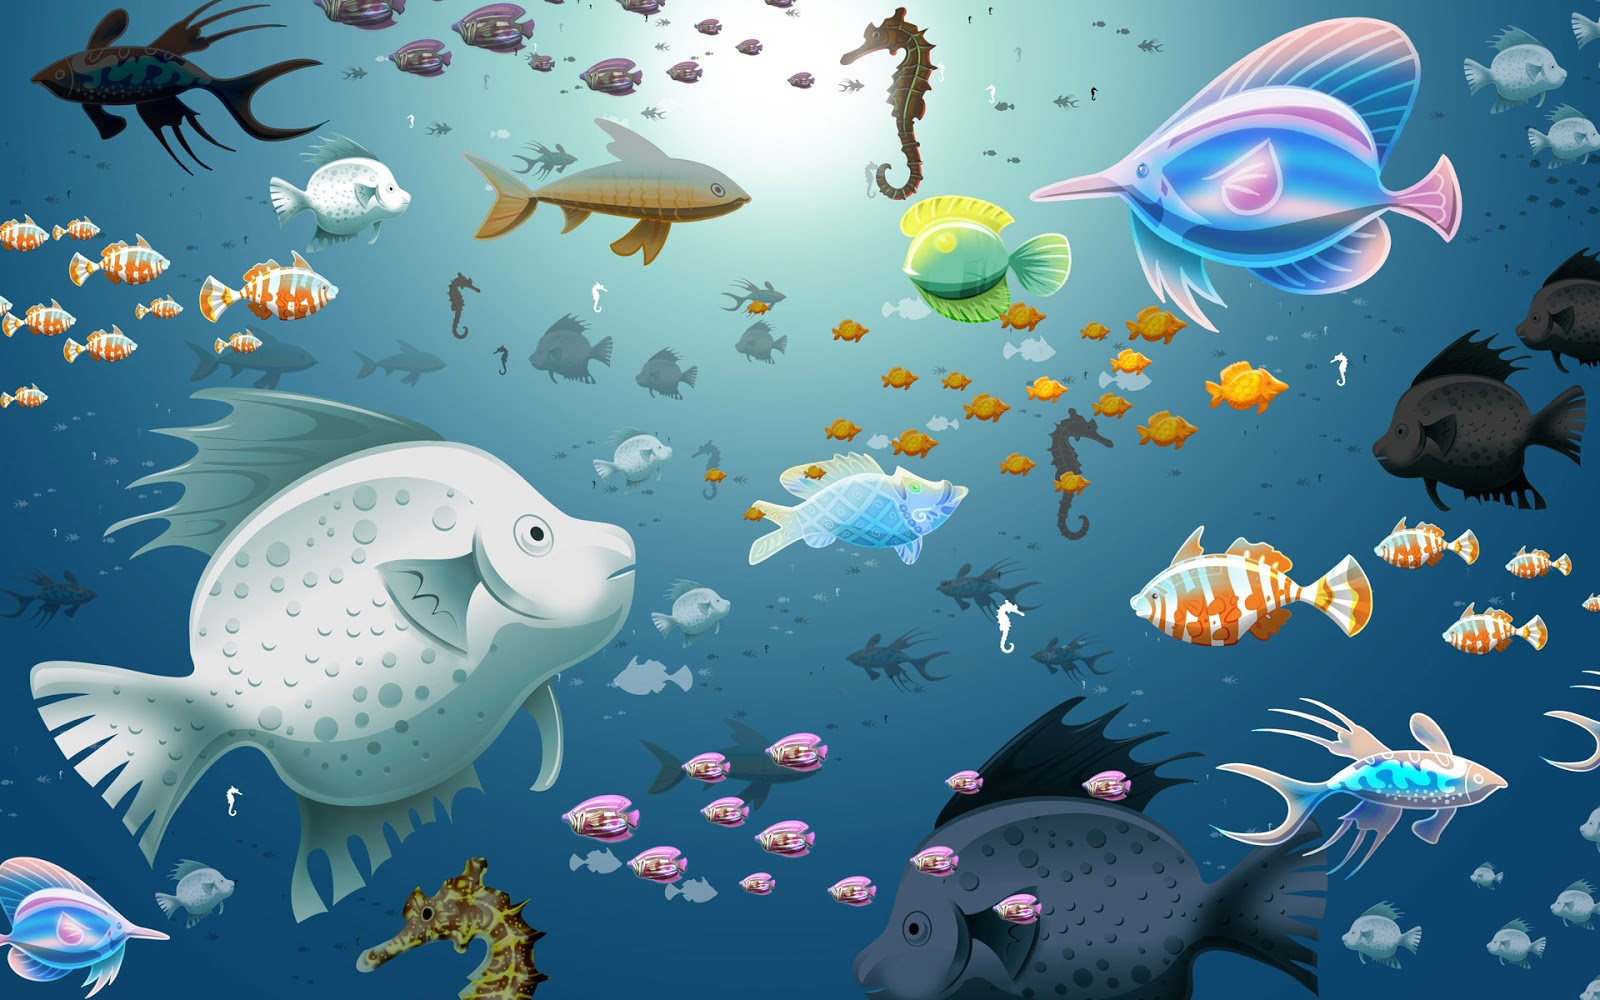 animation wallpaper animation wallpaper animation wallpaper animation 1600x1000